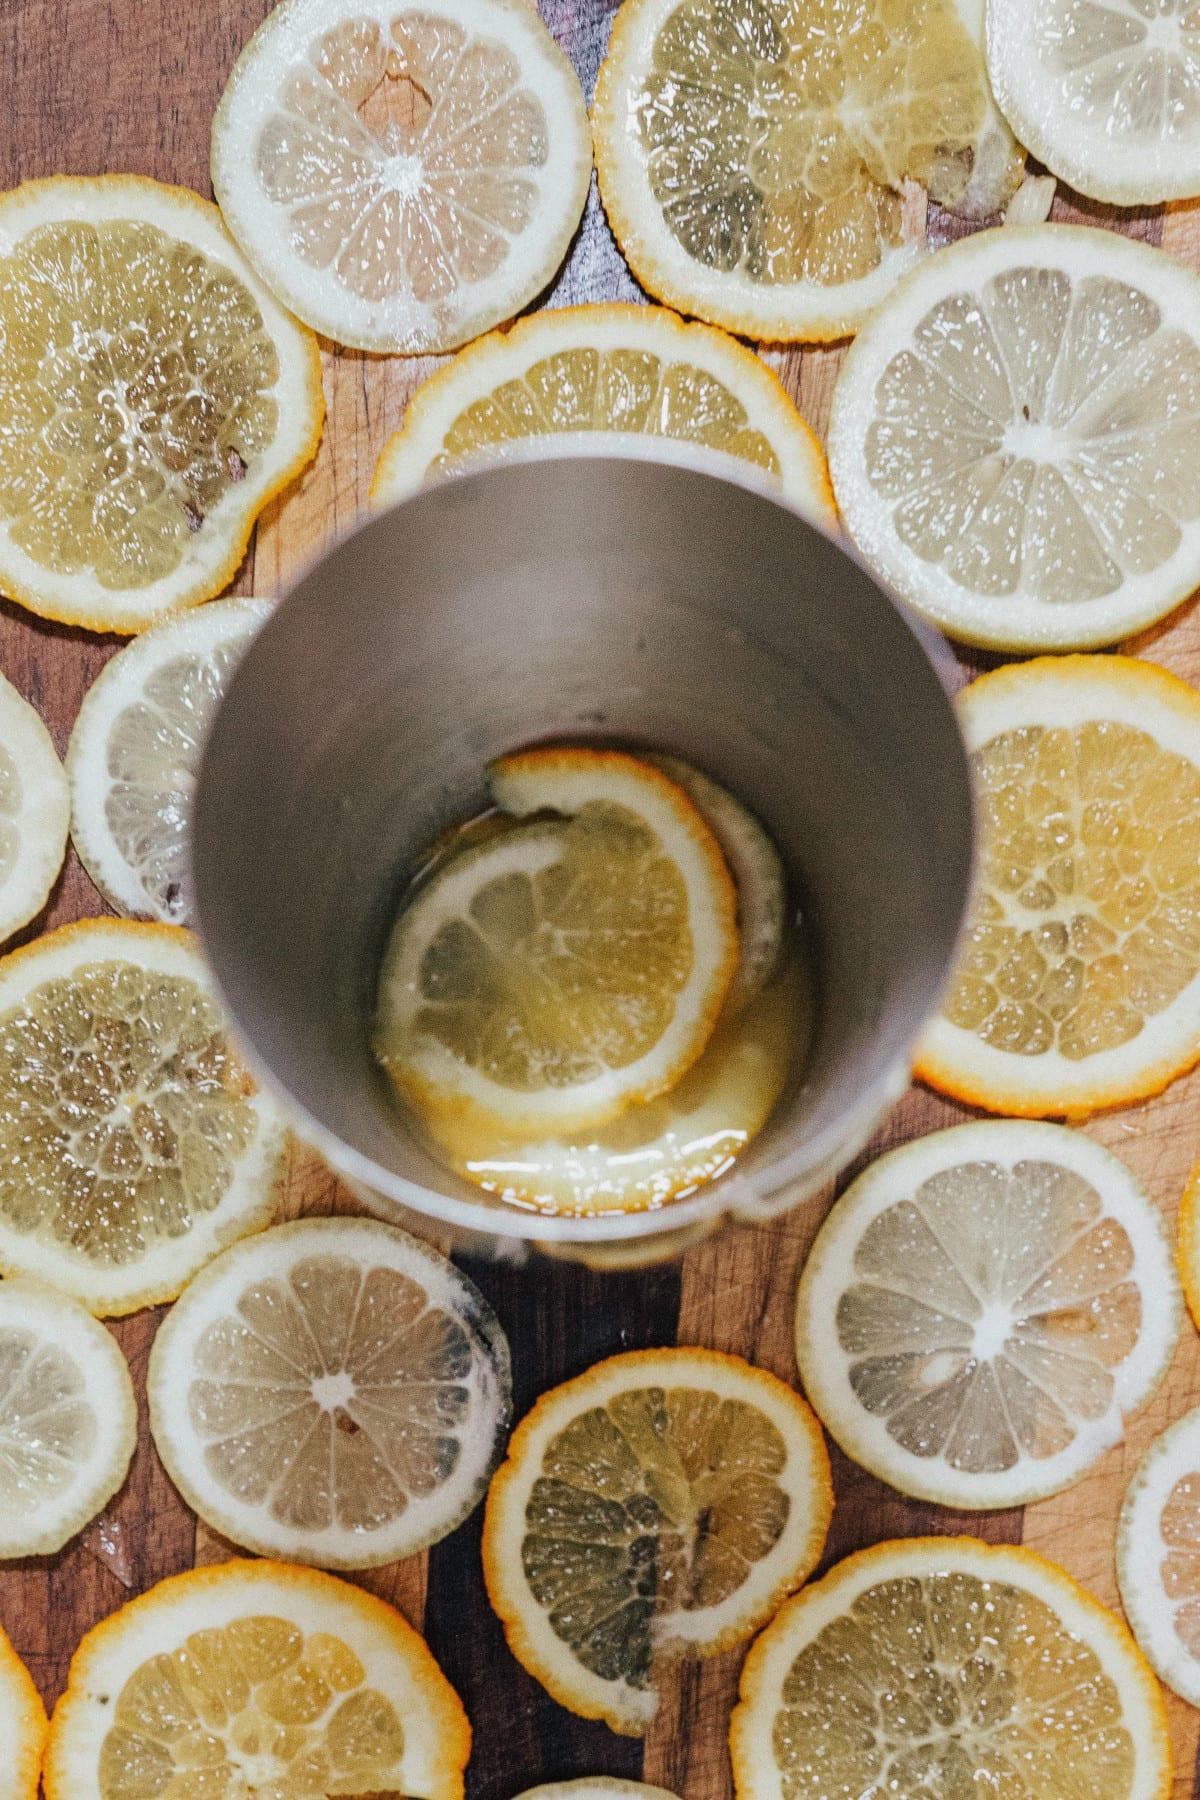 Table full of citrus wedges